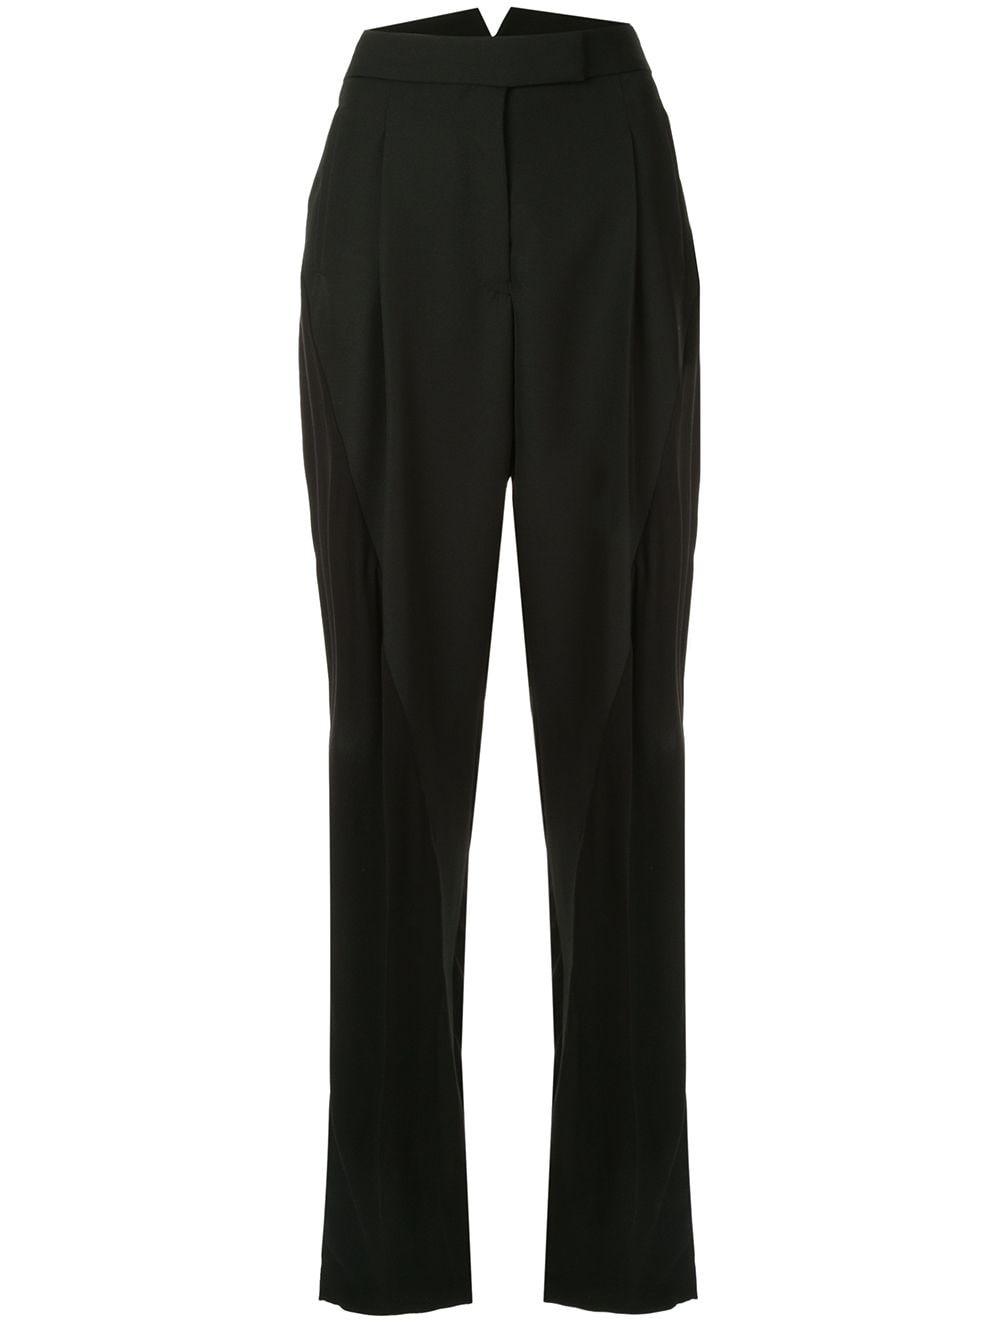 High Waisted Trousers - Sz 40-1